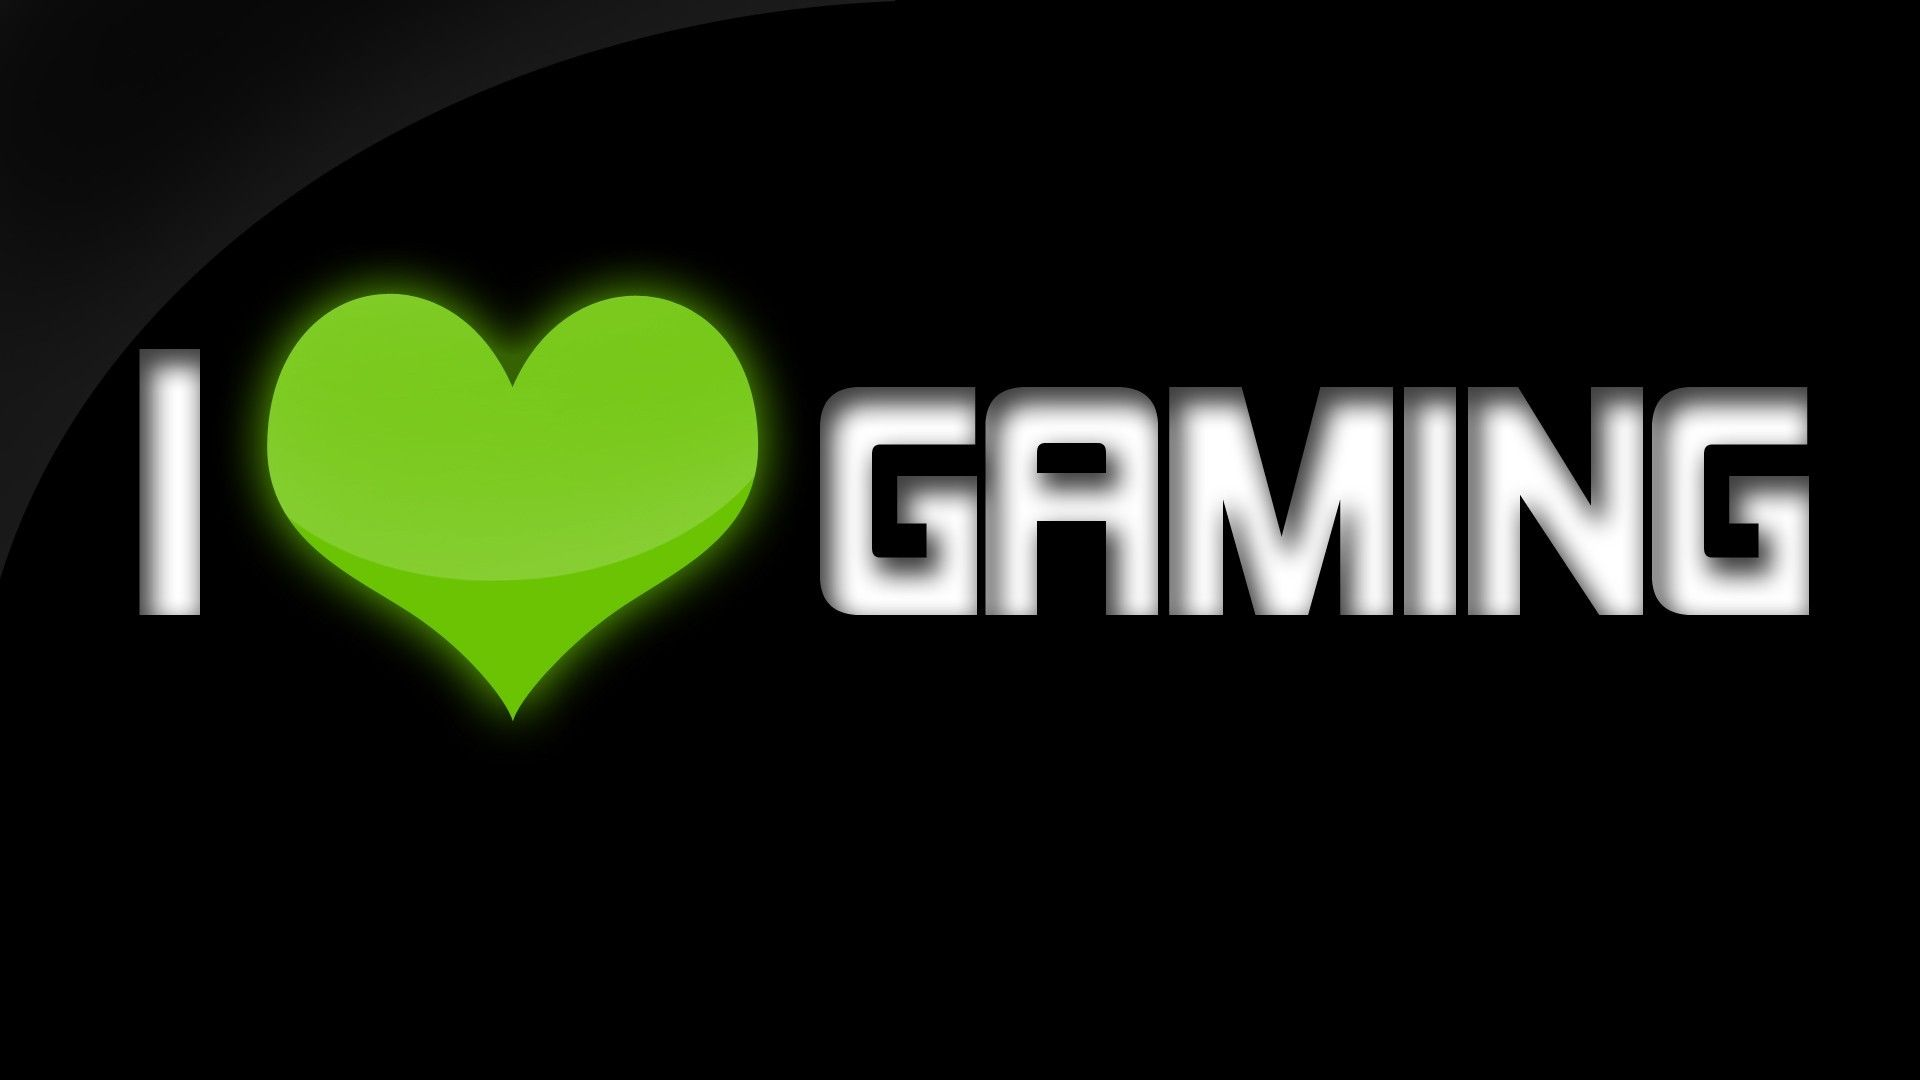 I Love Gaming Gaming Wallpapers Hd Pc Games Wallpapers Gaming Wallpapers